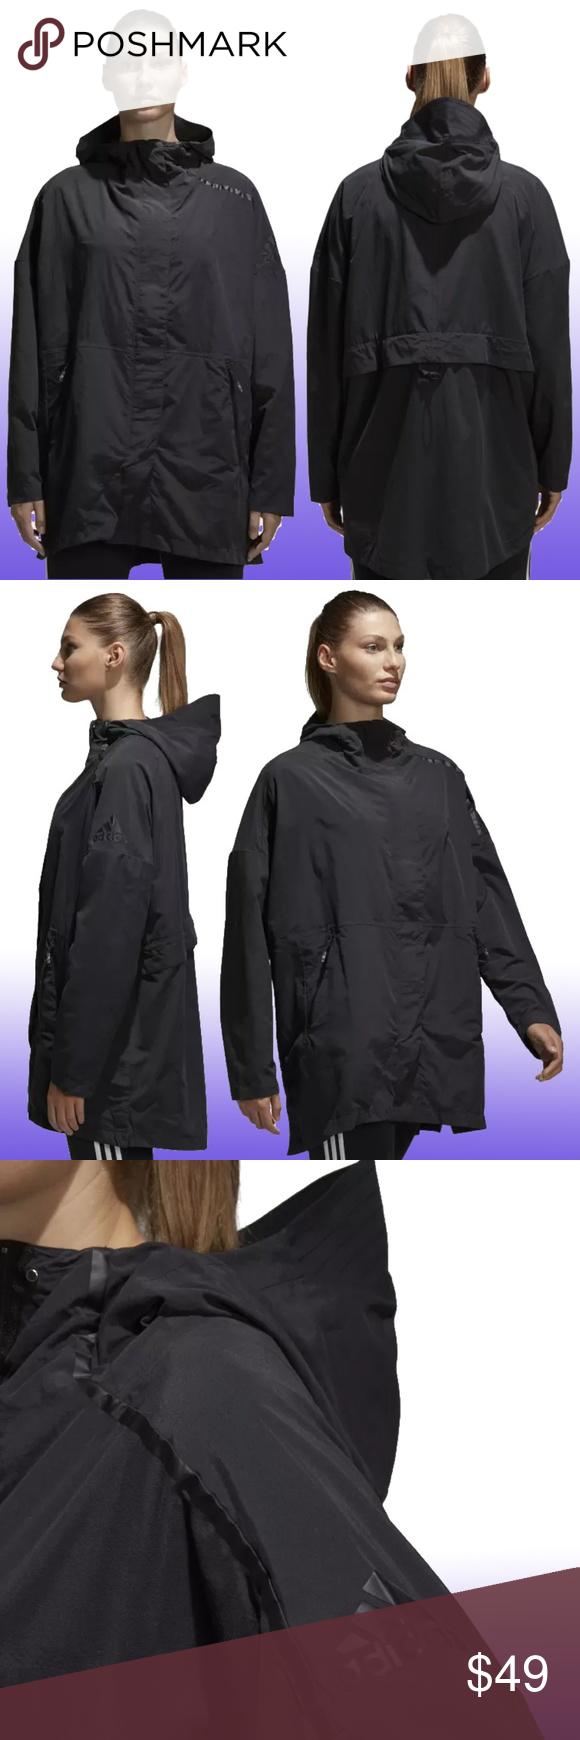 NWT ADIDAS Z.N.E. Supershell Oversized Fall Jacket Very